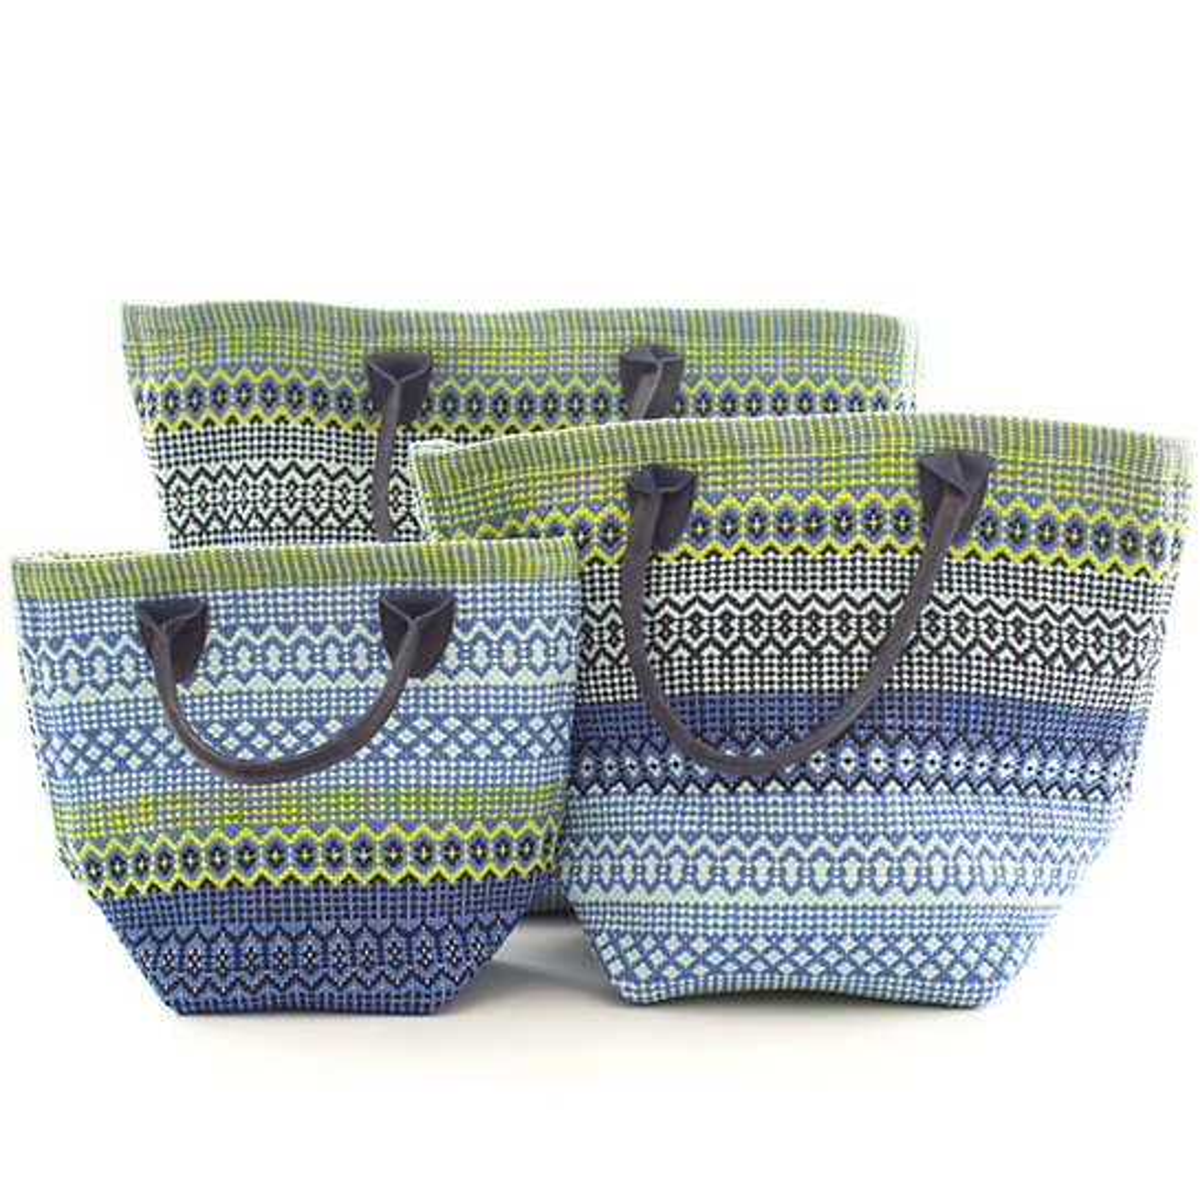 Le Tote Fiesta Stripe French Blue/Green Tote Bag